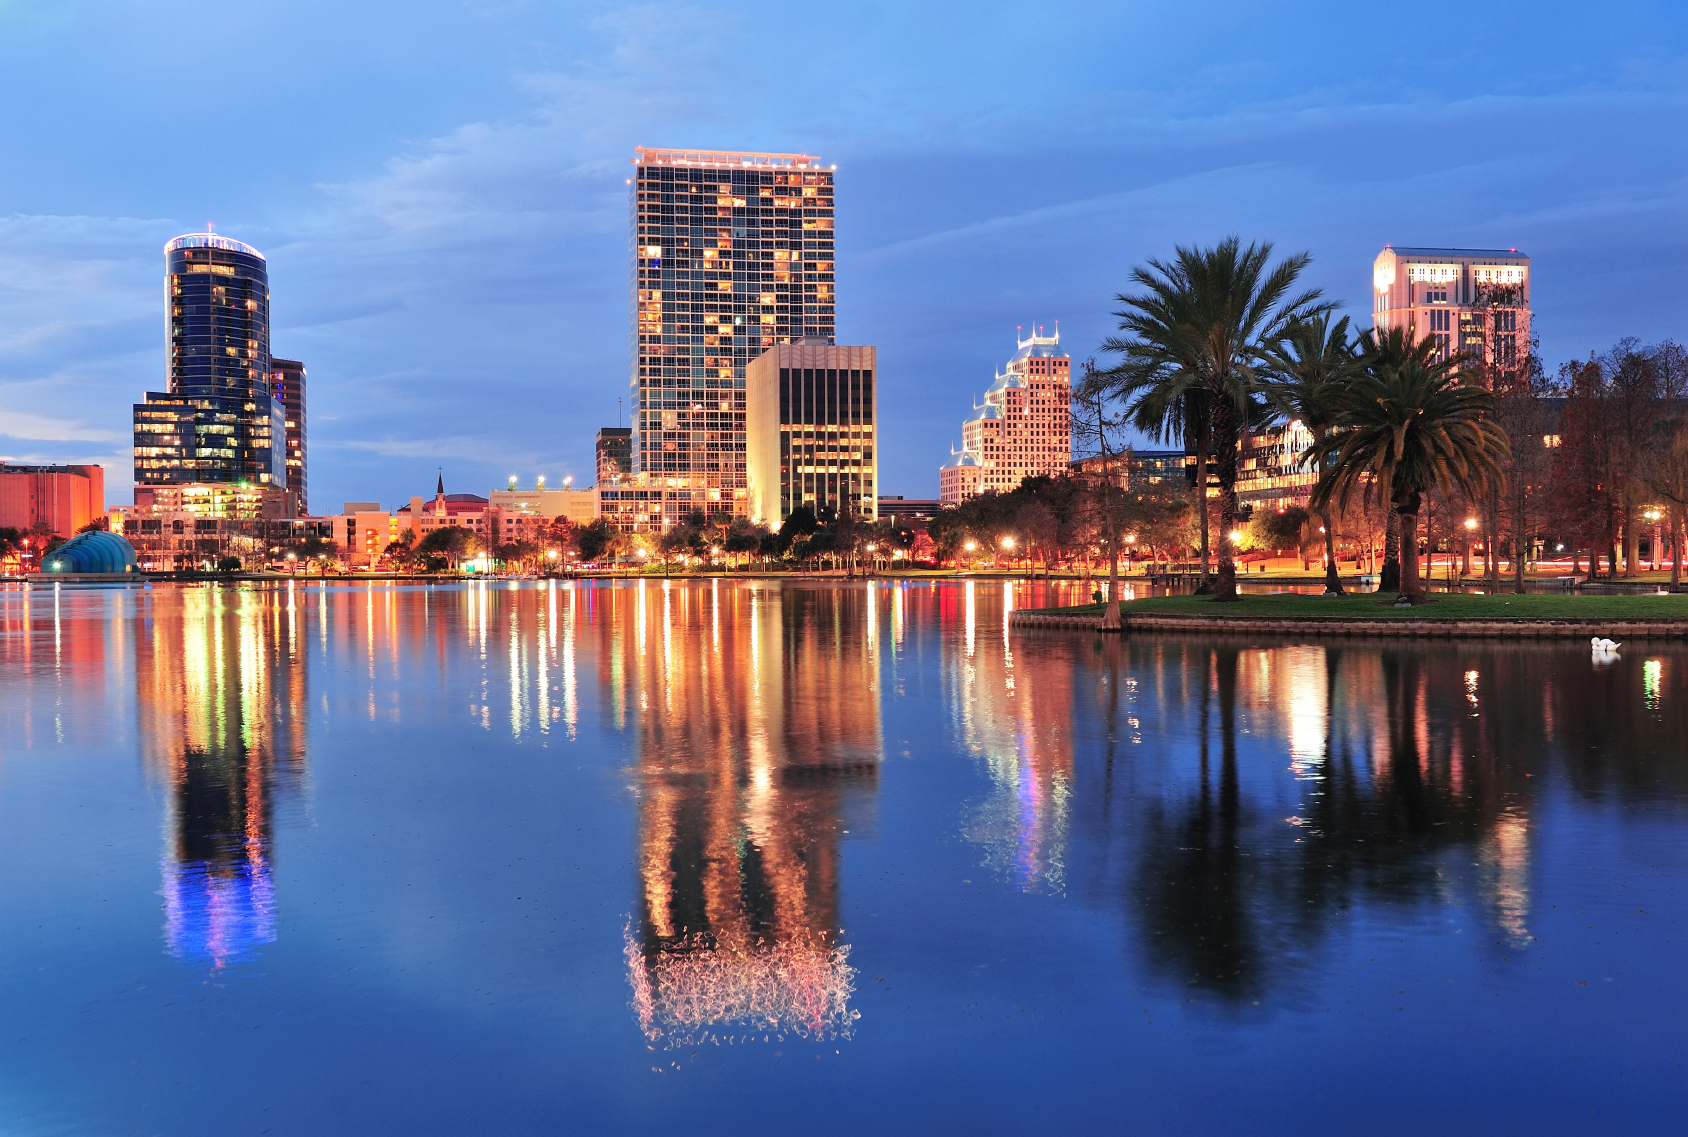 Orlando downtown dusk